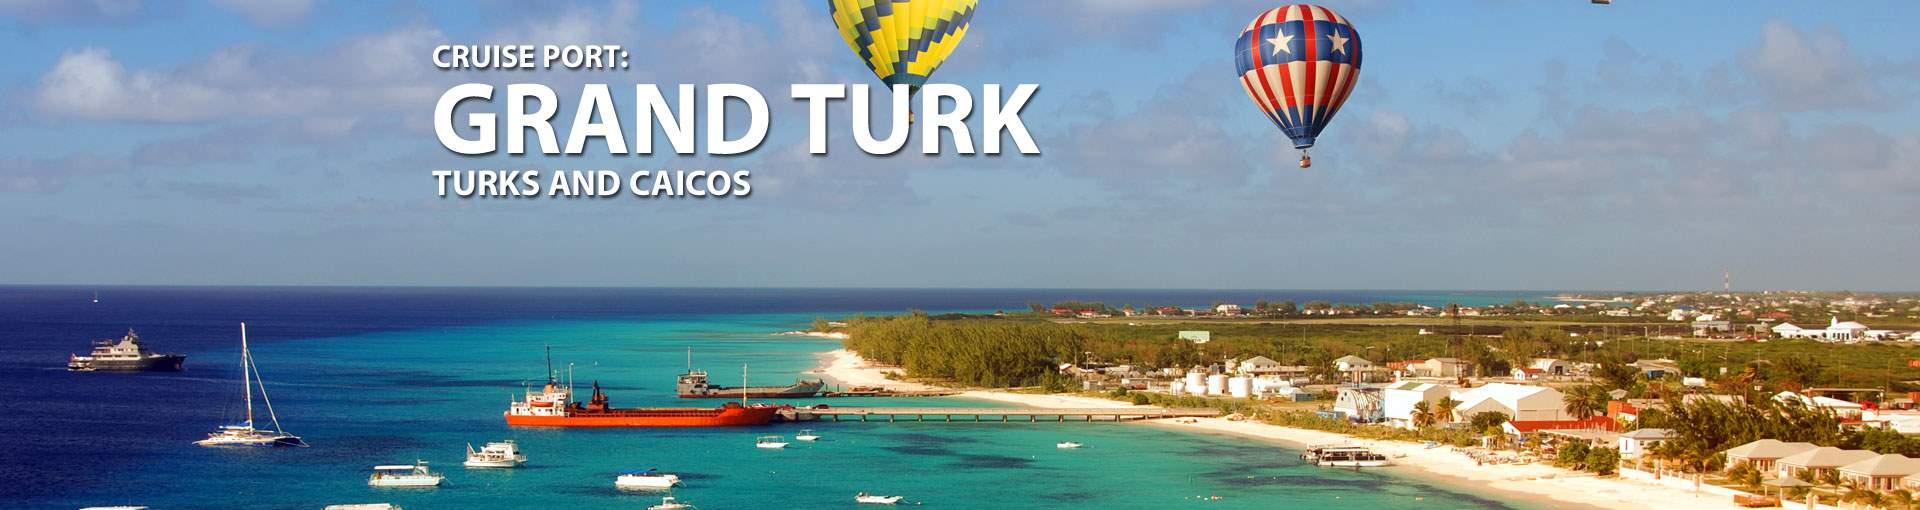 Caribbean weddings grand turk - Cruises To Grand Turk Turks And Caicos